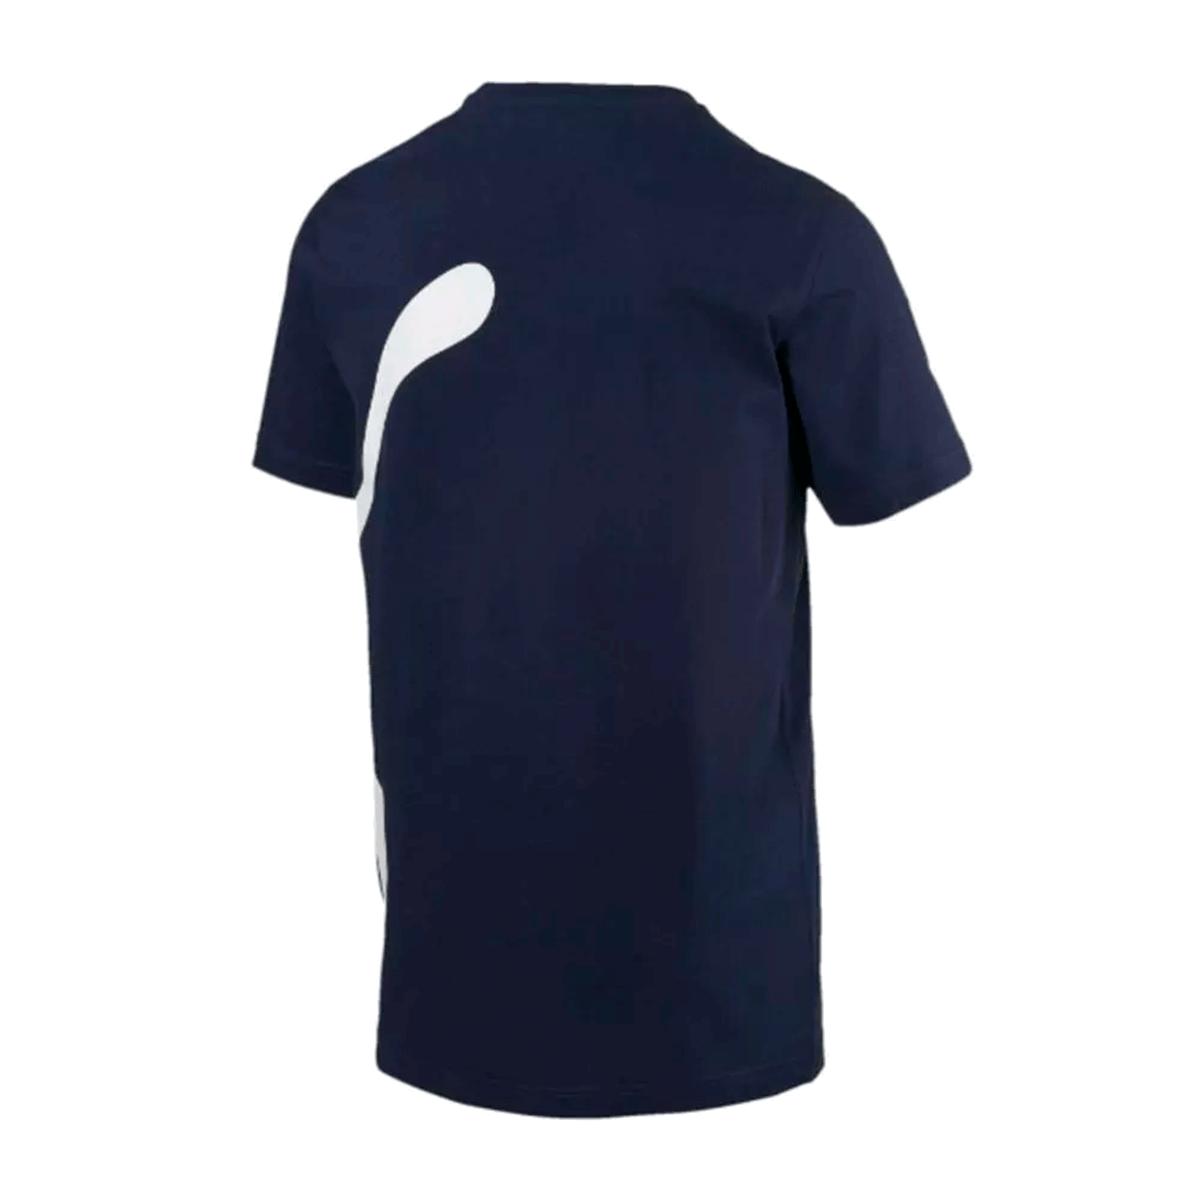 Camisa Puma Big Logo Tee Masculino Azul Marinho